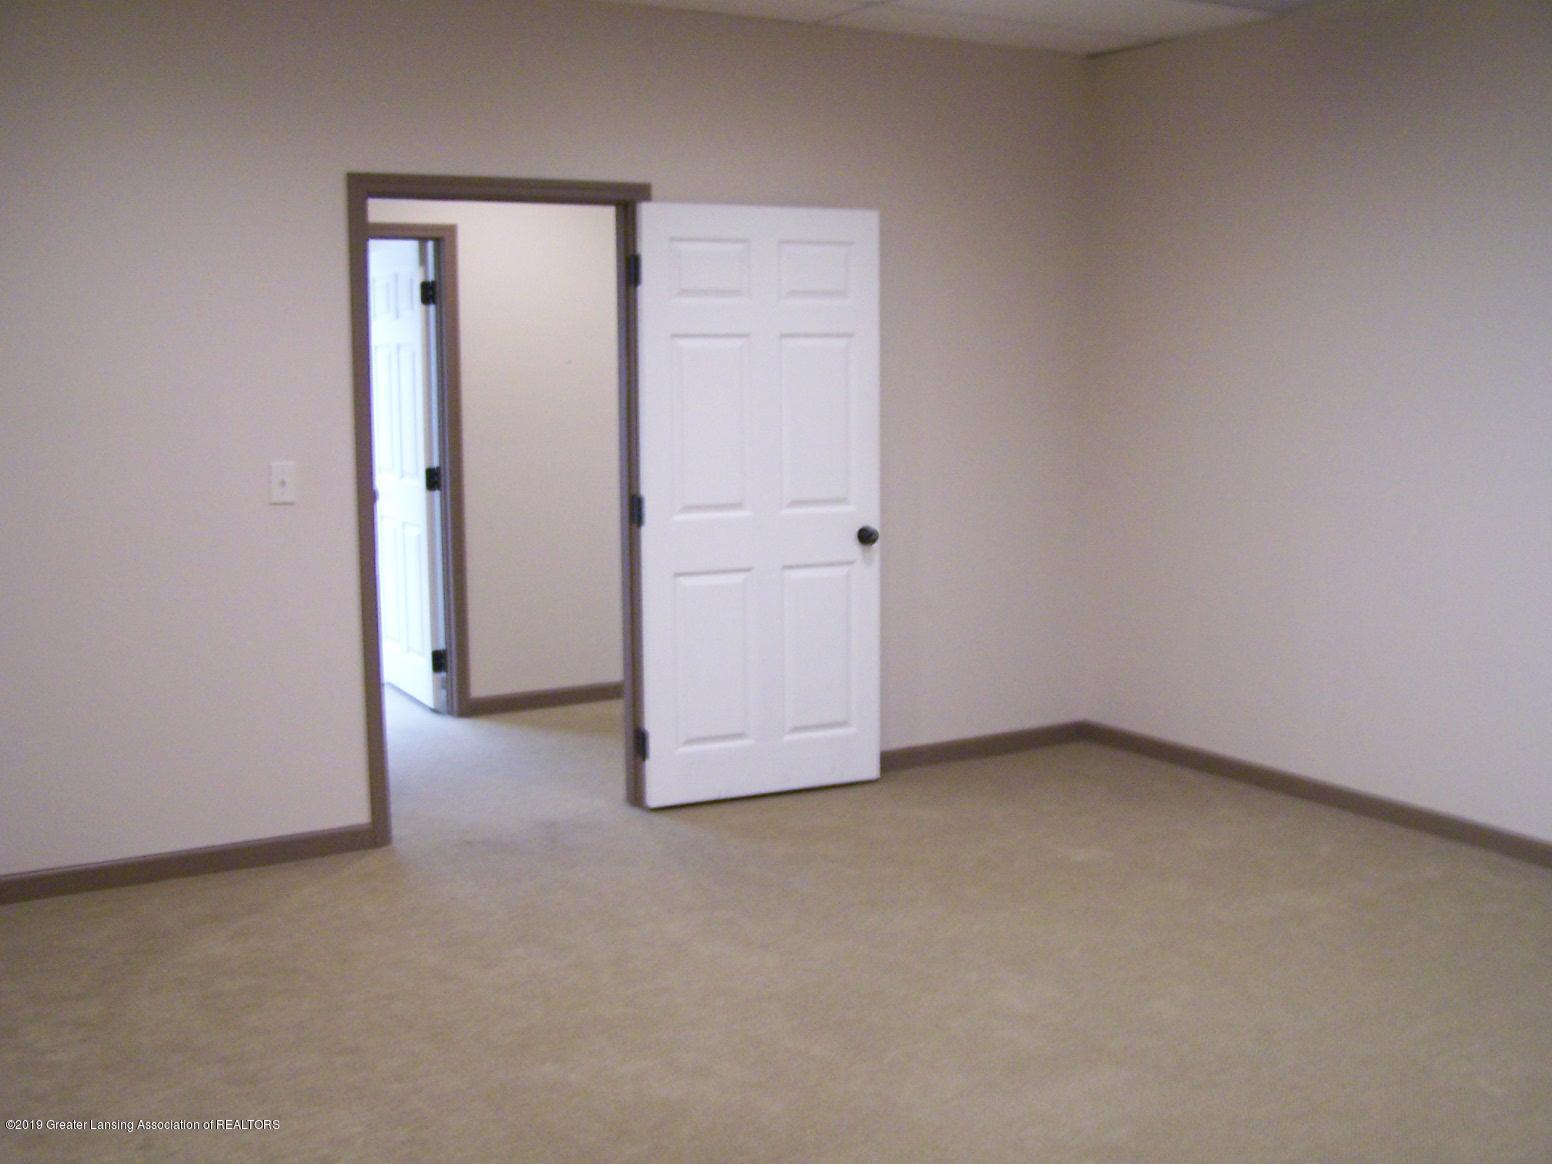 111 W Hamlin St - office 5 - 20